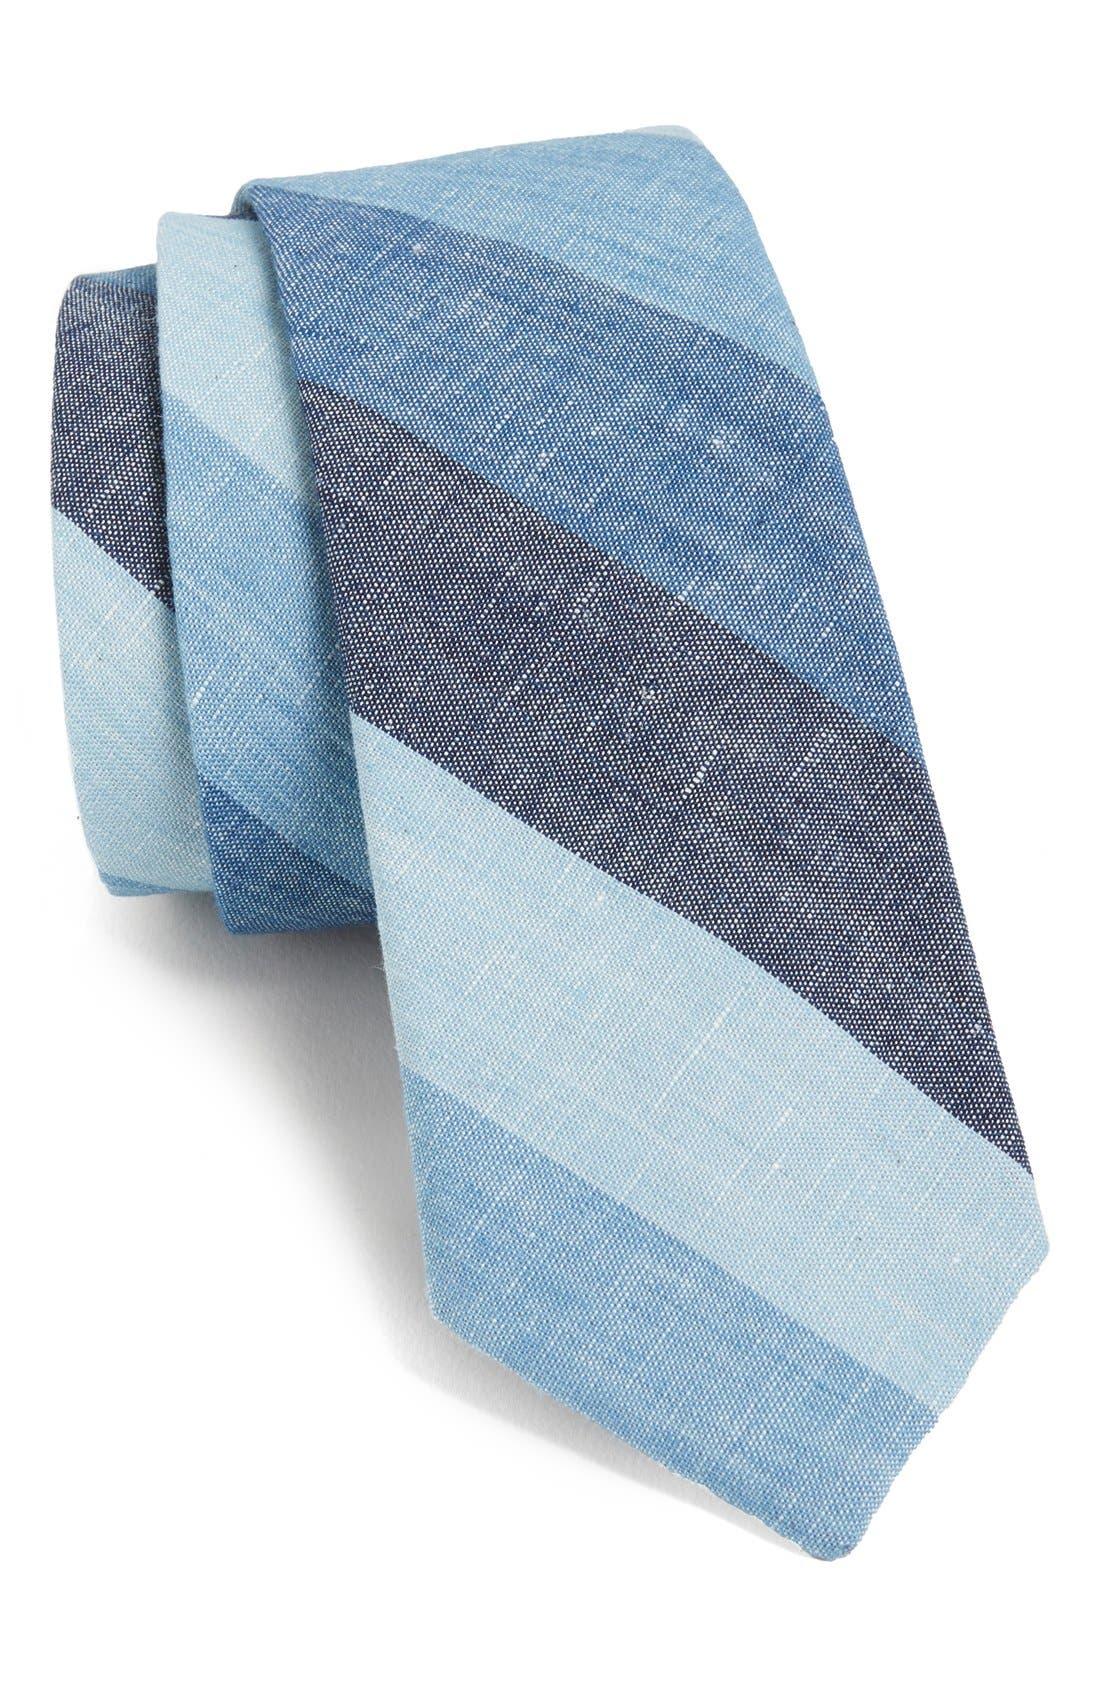 Alternate Image 1 Selected - rag & bone Stripe Tie